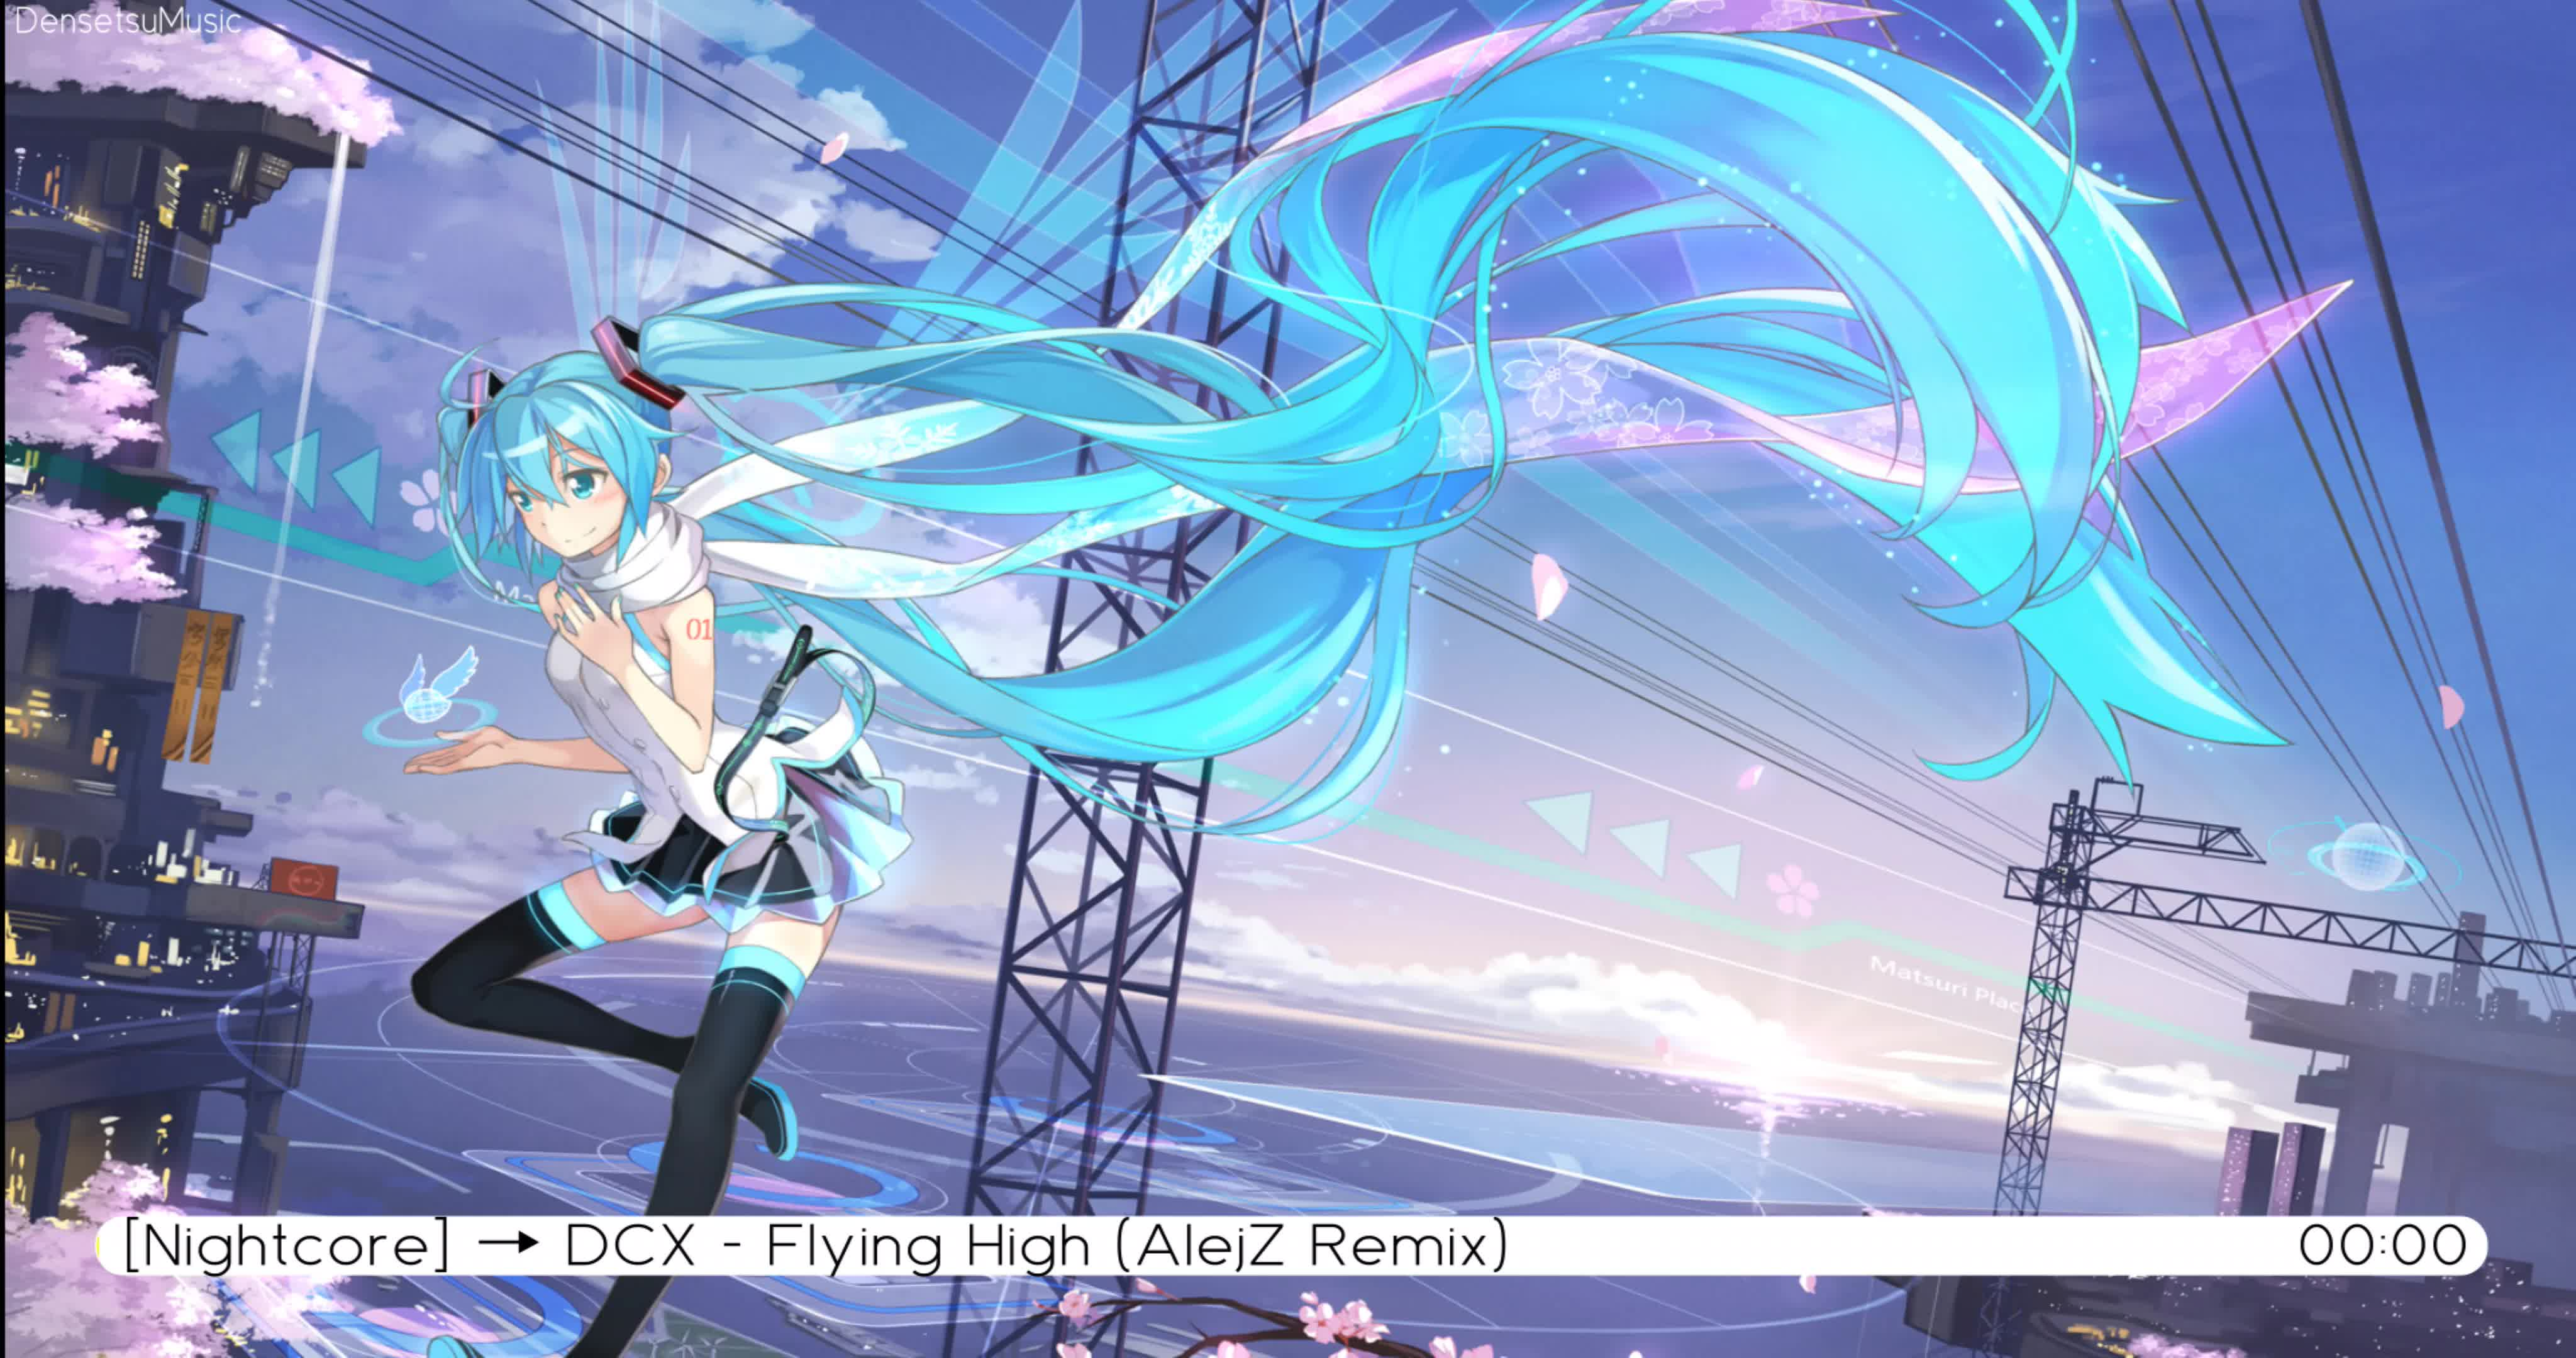 [Nightcore] → DCX - Flying High (AlejZ Remix) [歌词]_哔哩哔哩 (゜-゜)つロ 干杯~-bilibili